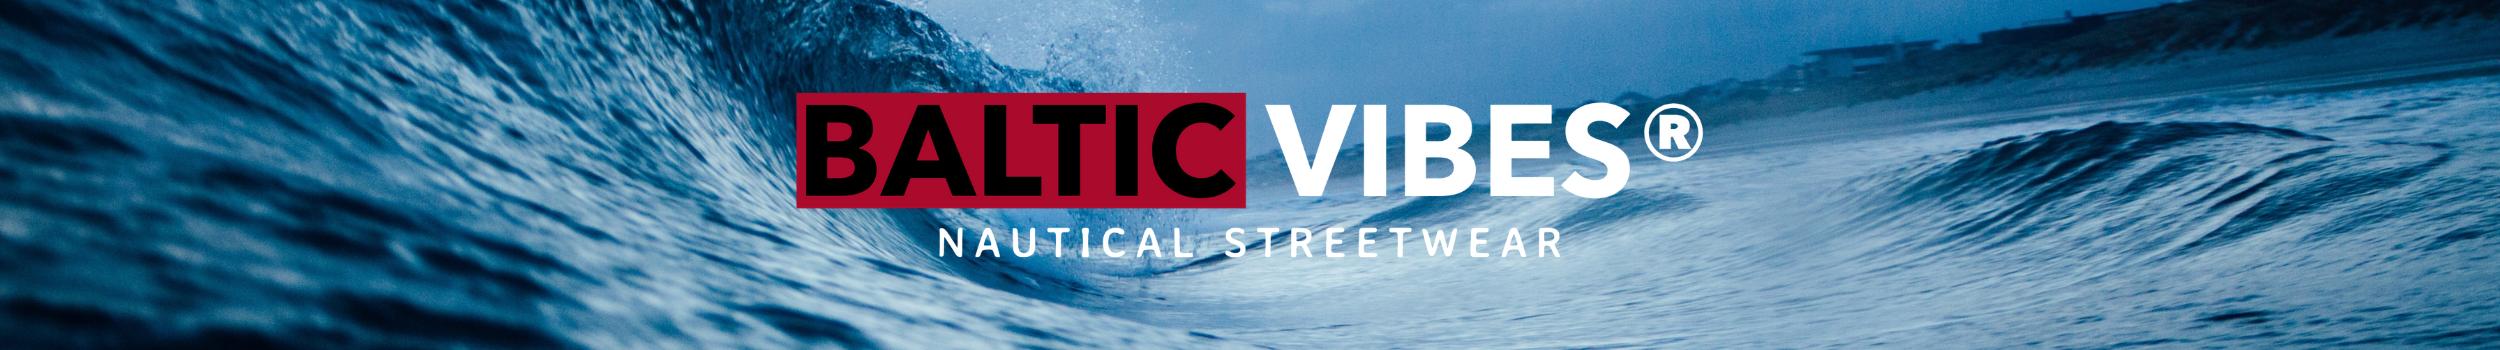 Baltic Vibes®